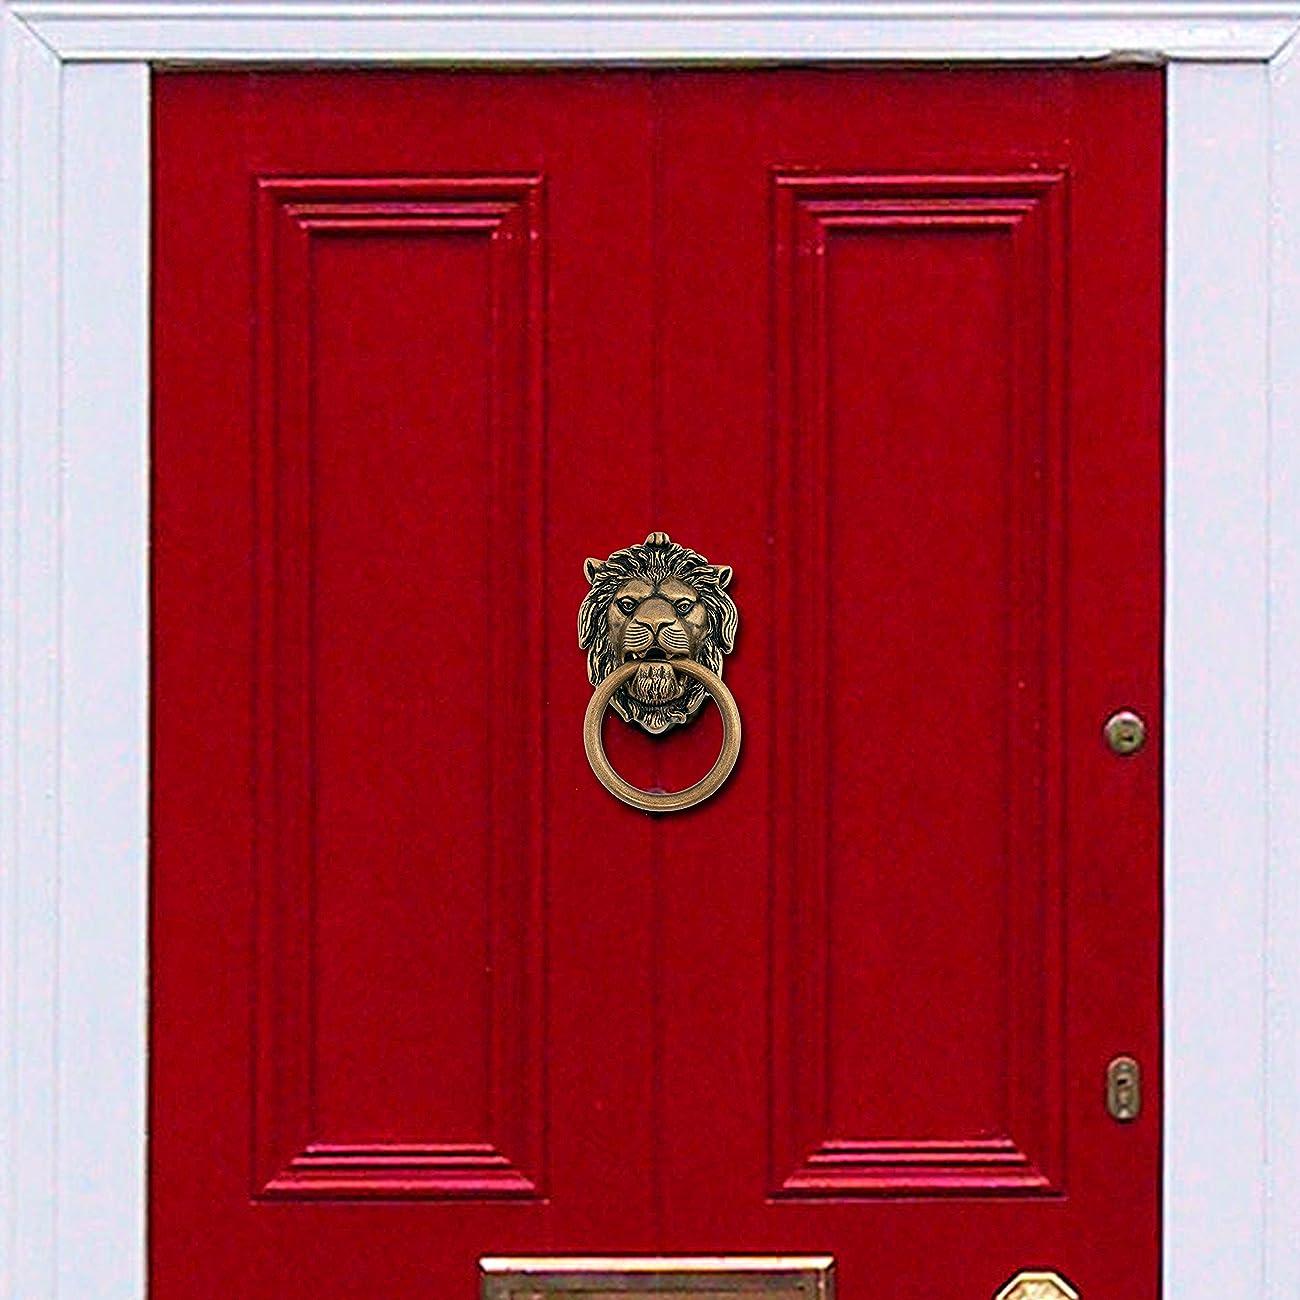 Bosetti Marella 100977.07 Brass Door Knocker, 4.29-by-7.48-Inch, Antique Brass Light 1